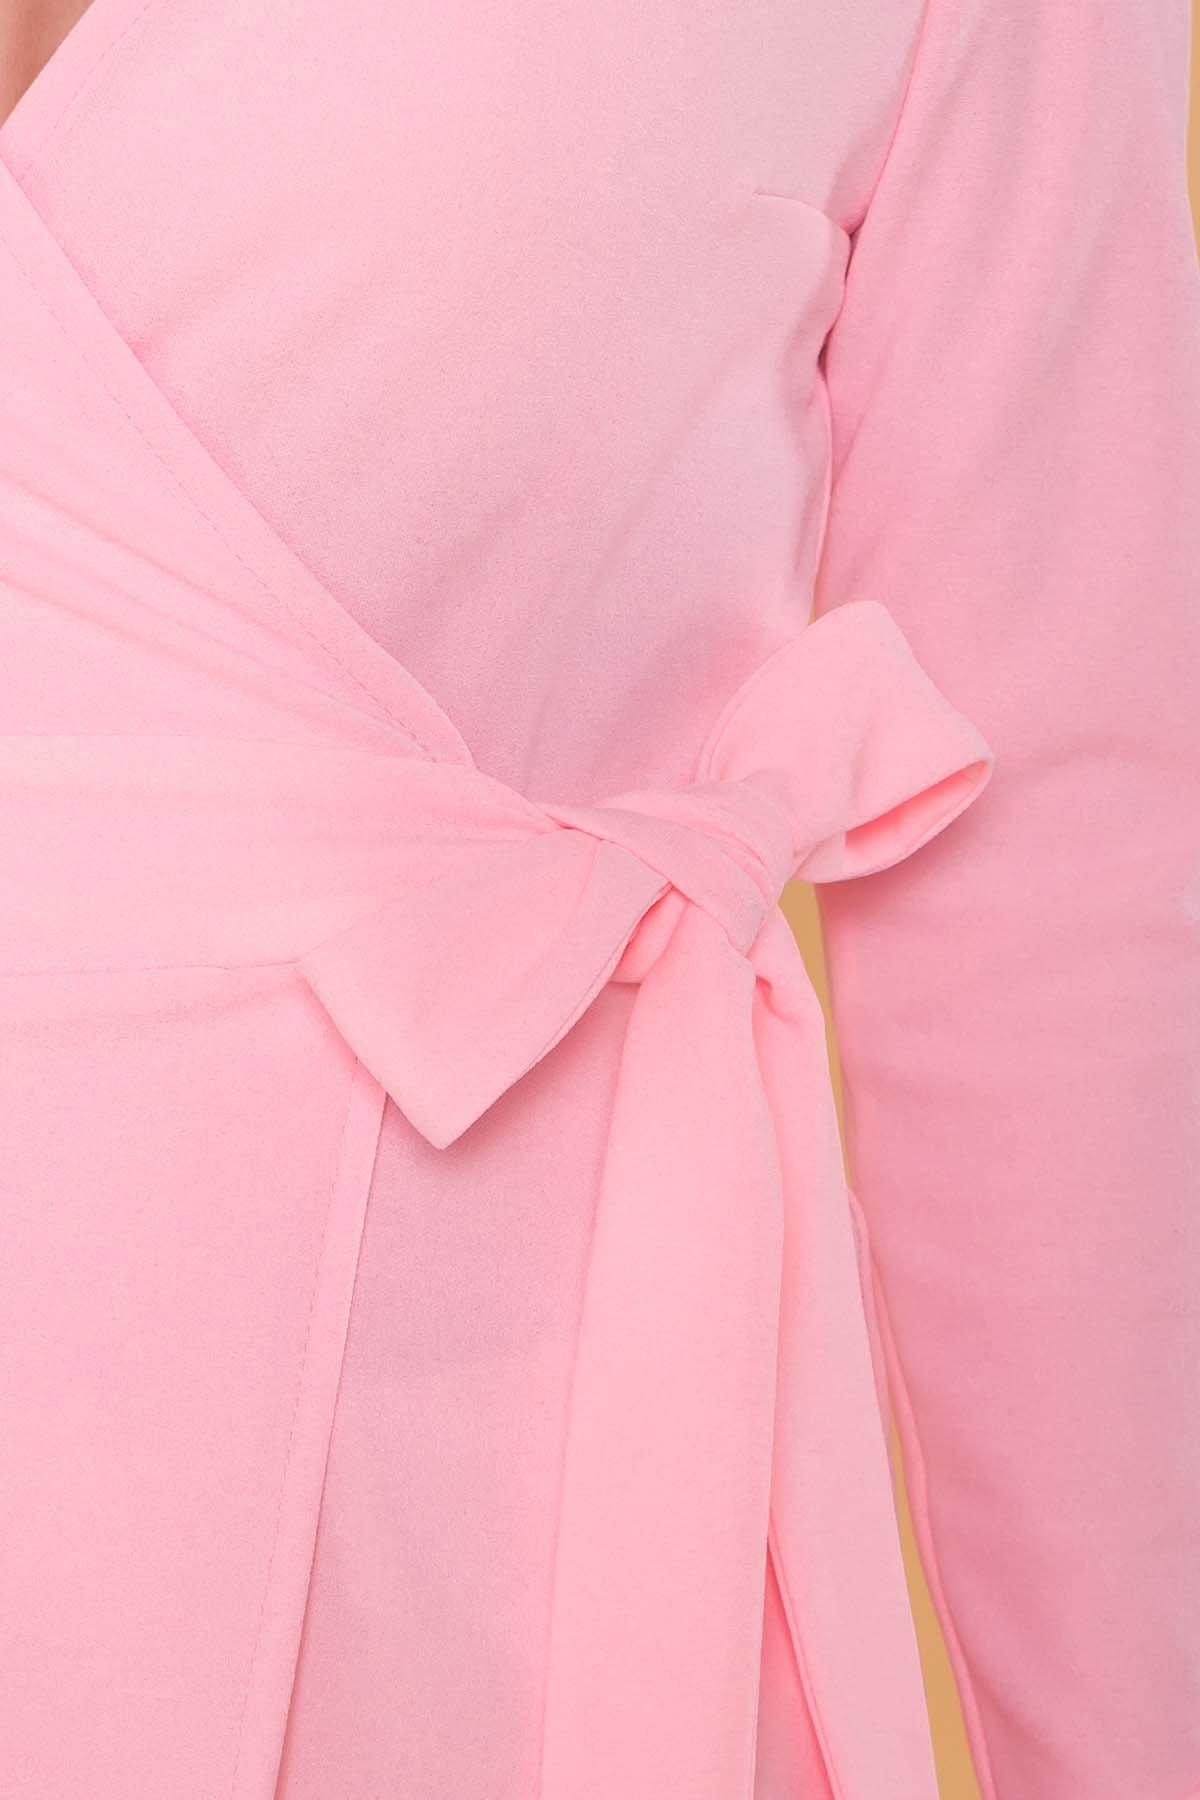 Блуза  Марсо 6432 АРТ. 41433 Цвет: Розовый - фото 4, интернет магазин tm-modus.ru